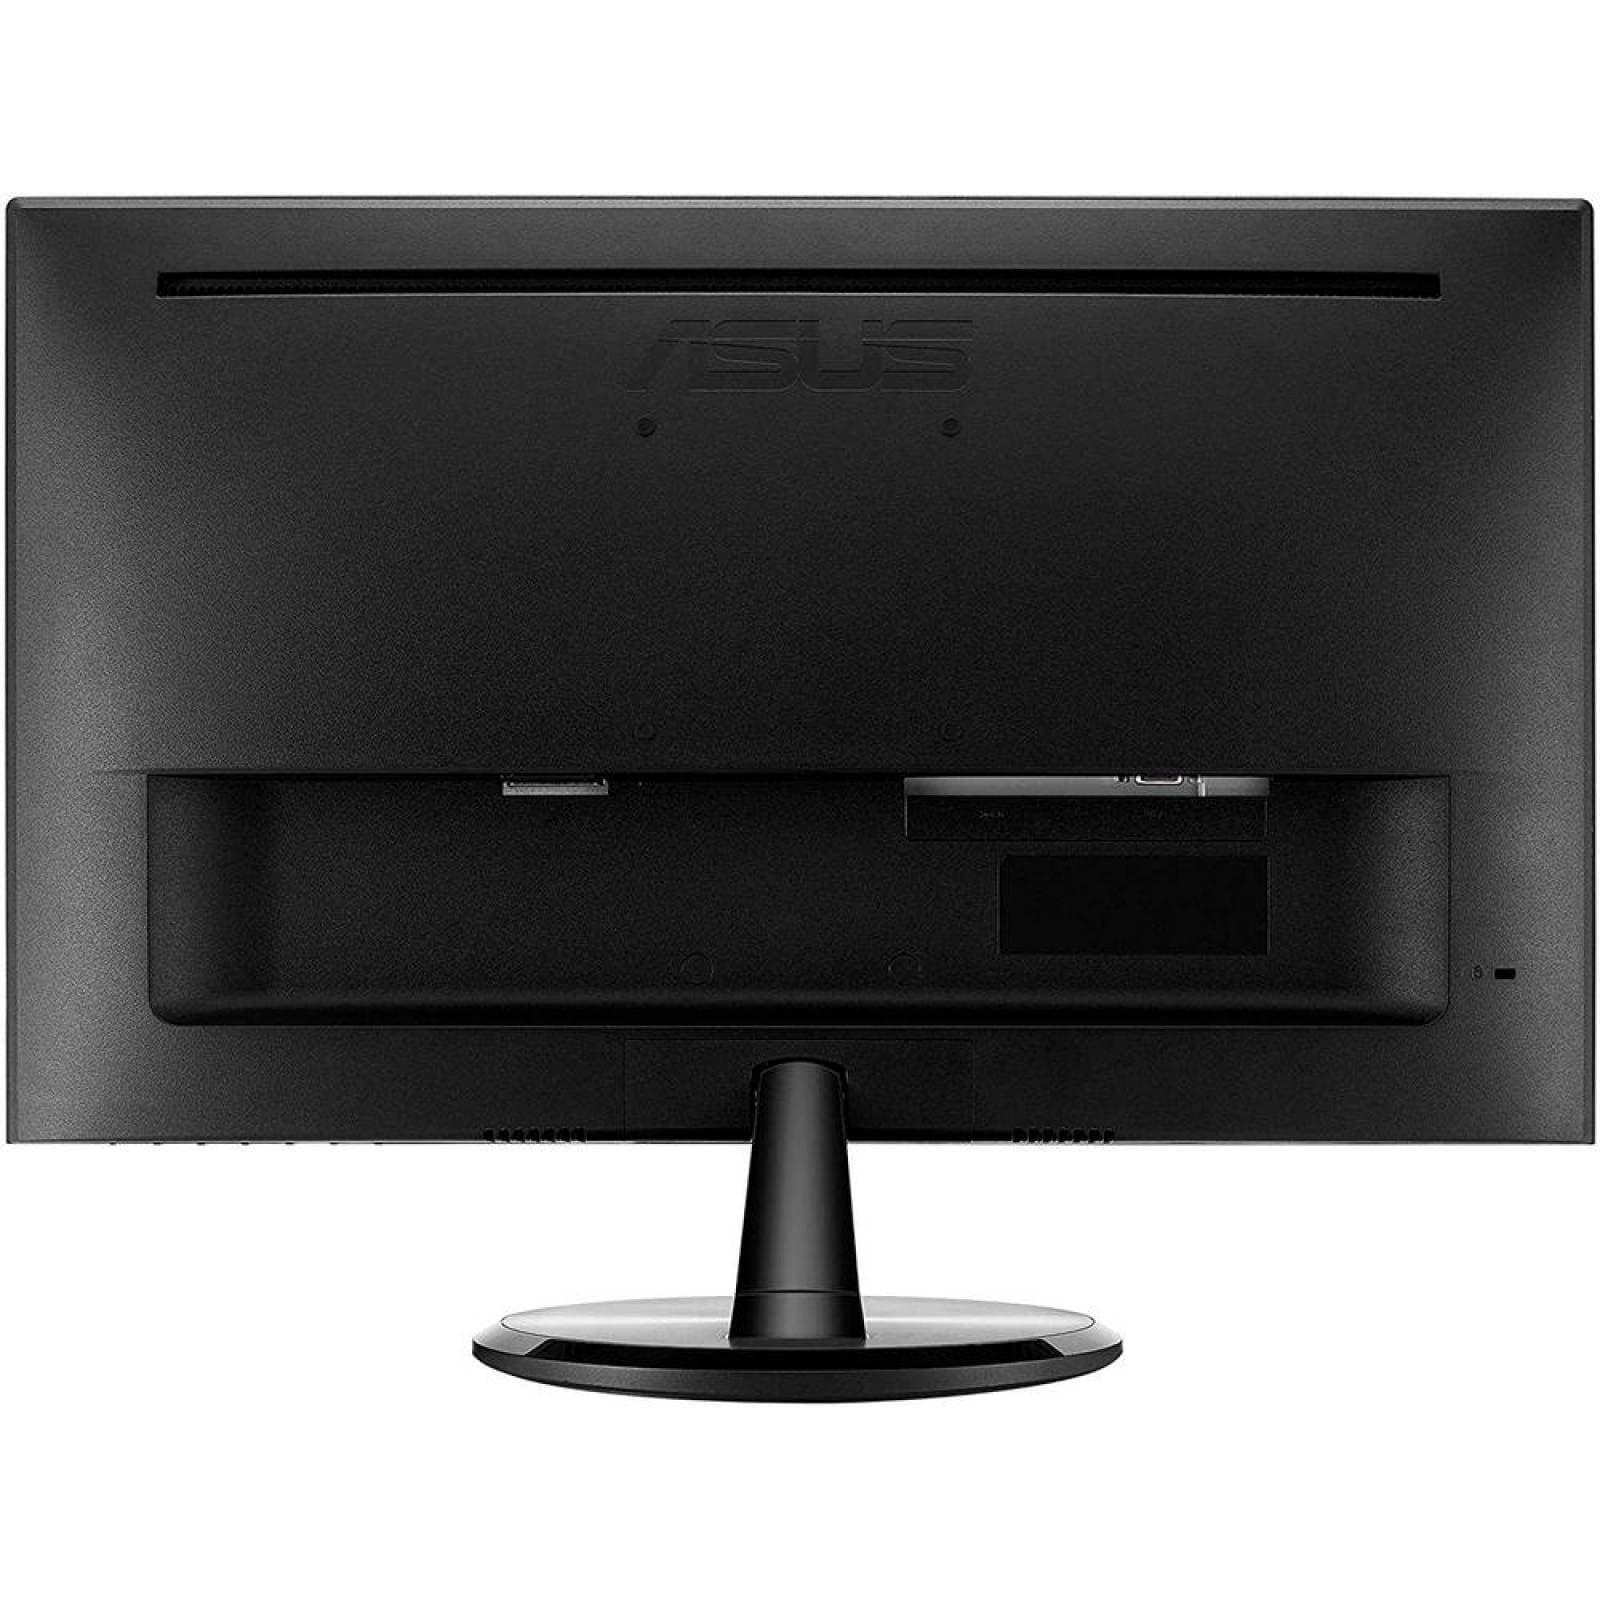 Monitor ASUS VP249HE 238 Pulgadas Full HD HDMI VGA DSub